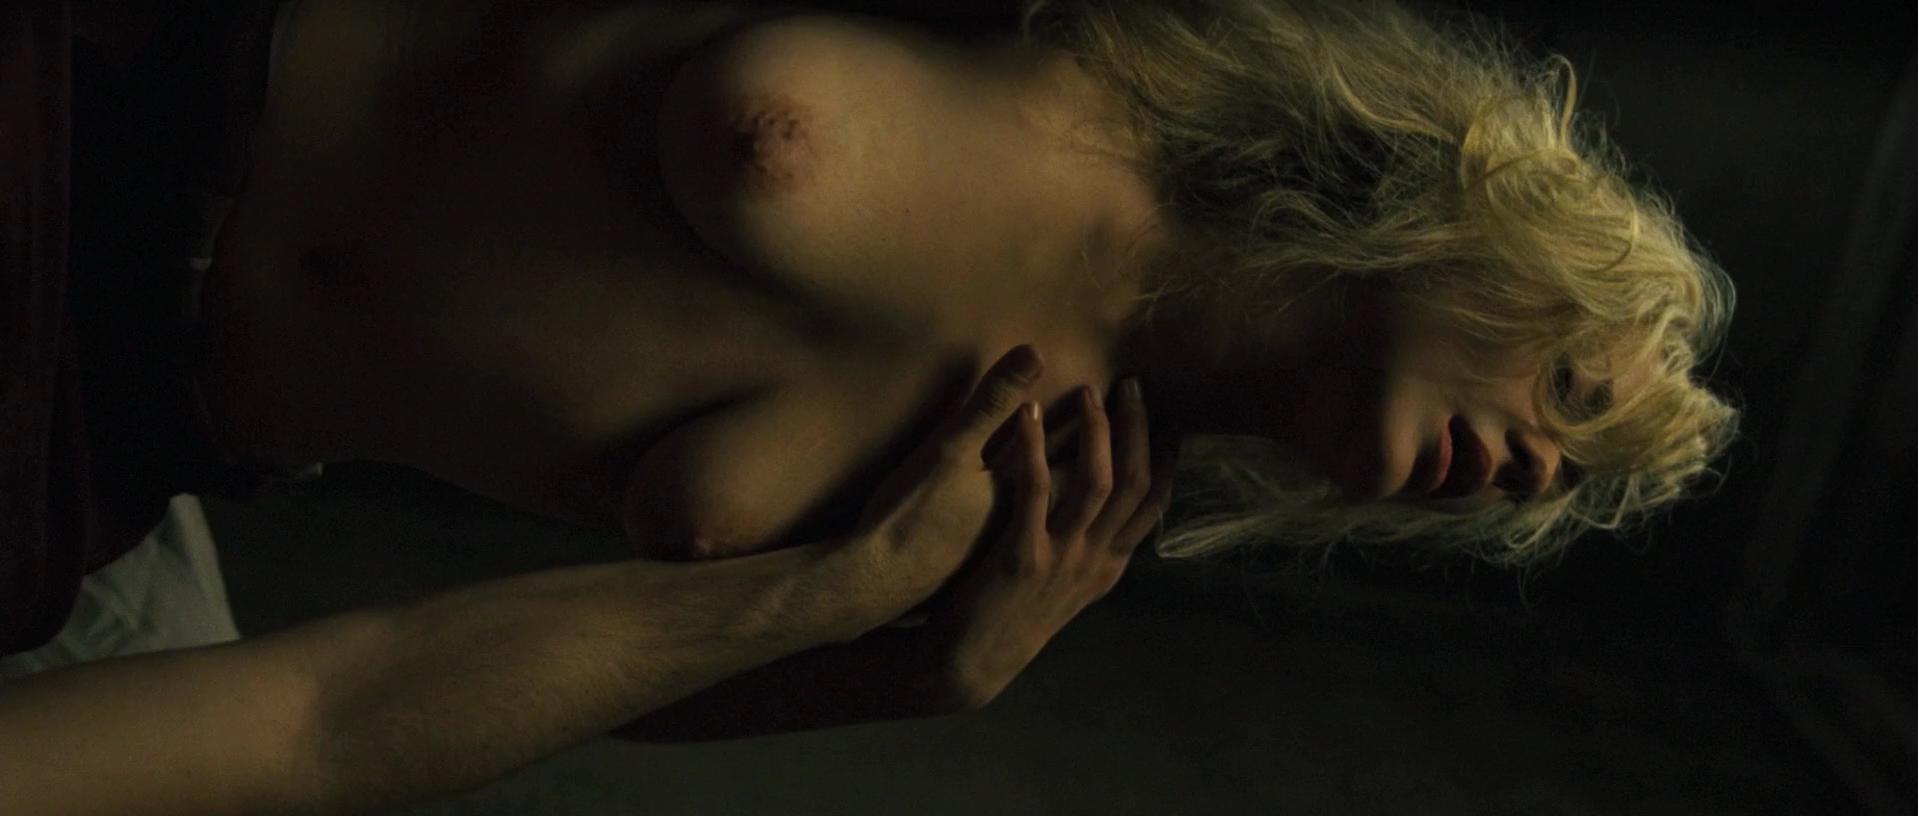 Marion Cotillard nude - La boite noire (2005)